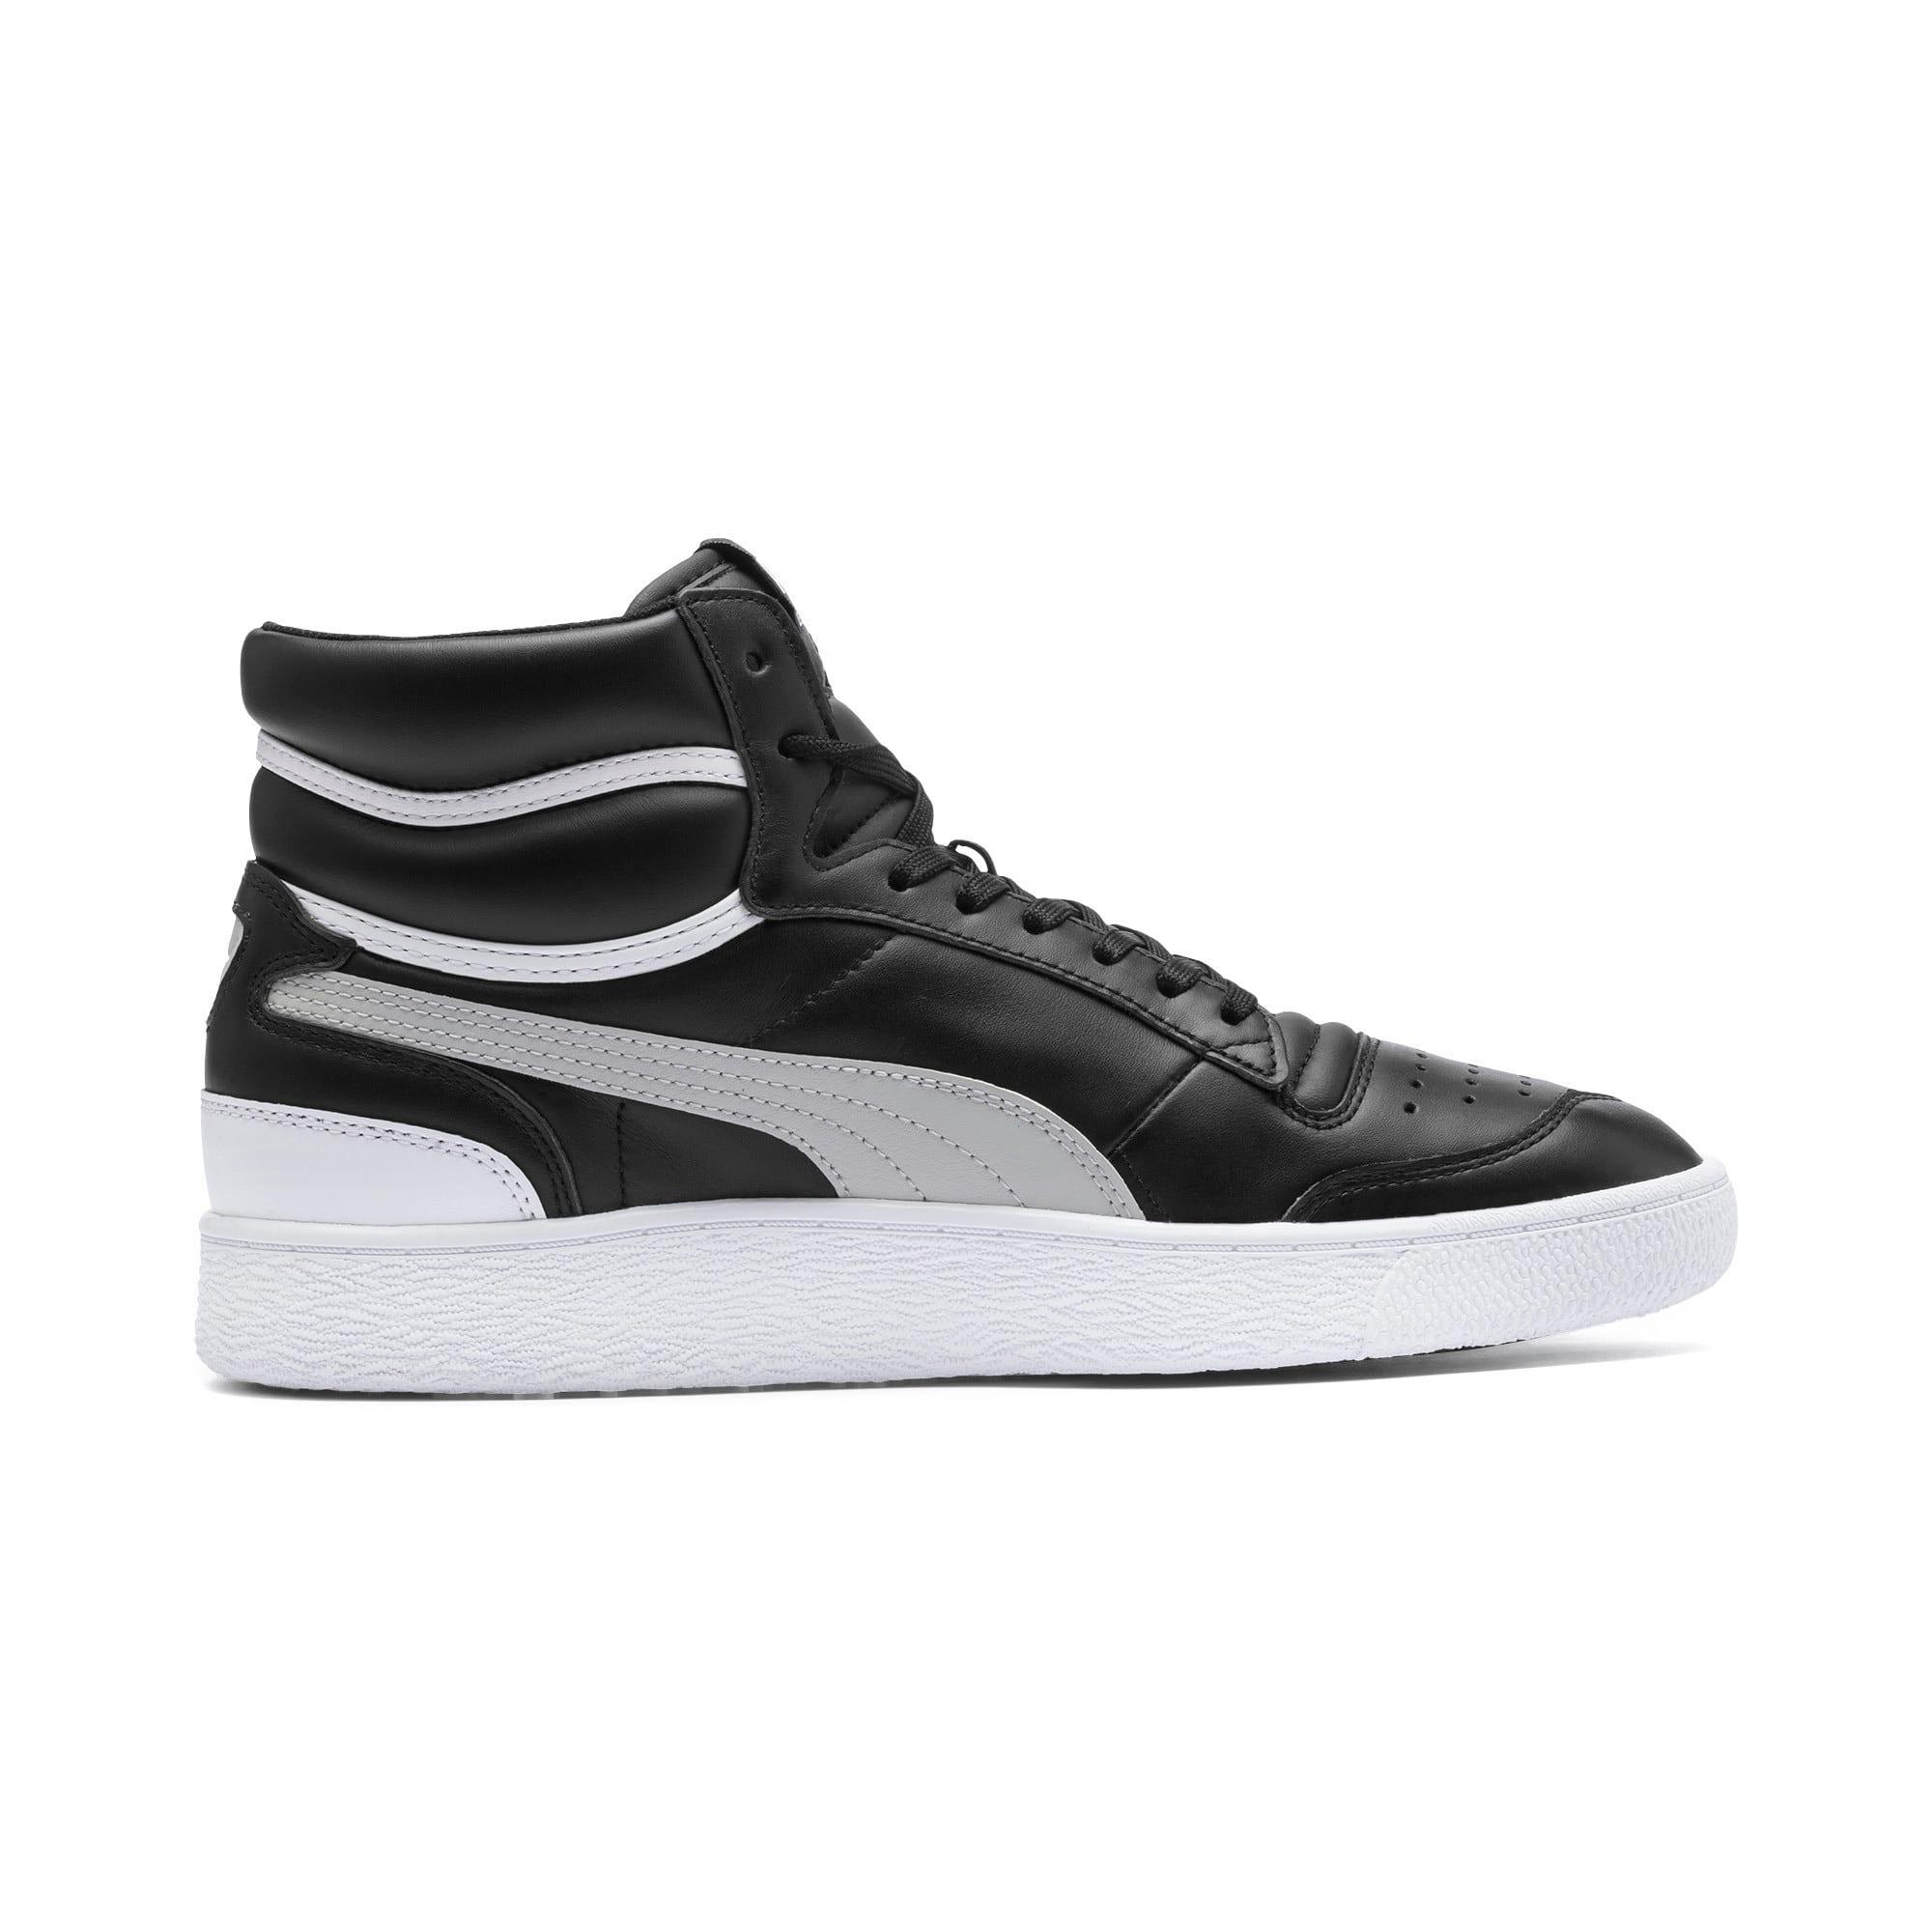 Thumbnail 5 of Ralph Sampson Mid Sneakers, PumaBlk-Gray Violet-PumaWht, medium